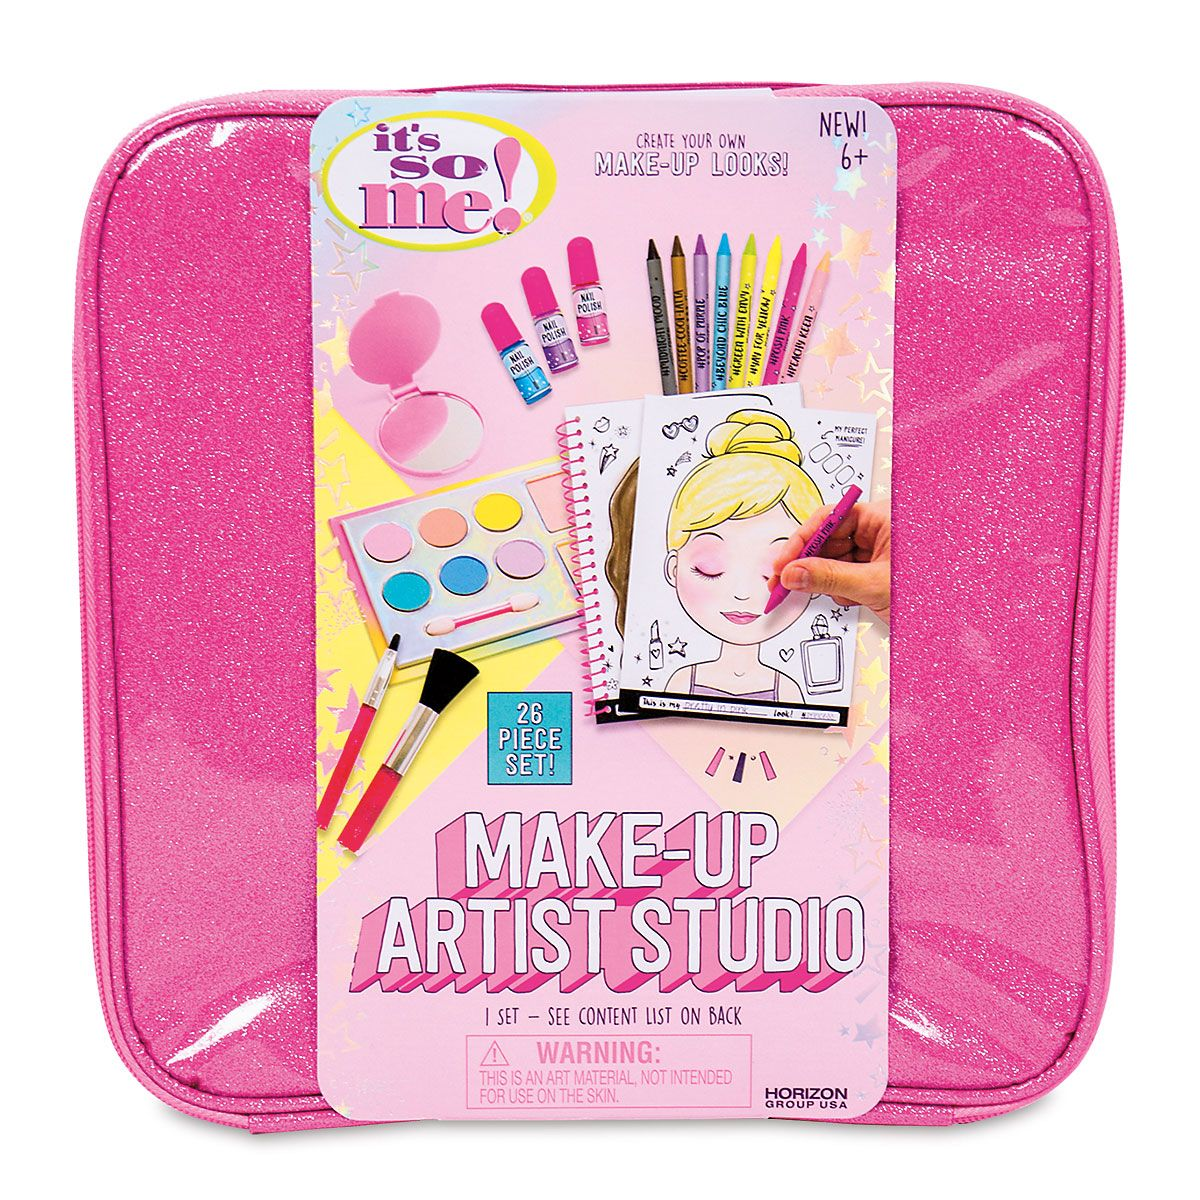 Personalized Make-Up Artist Studio